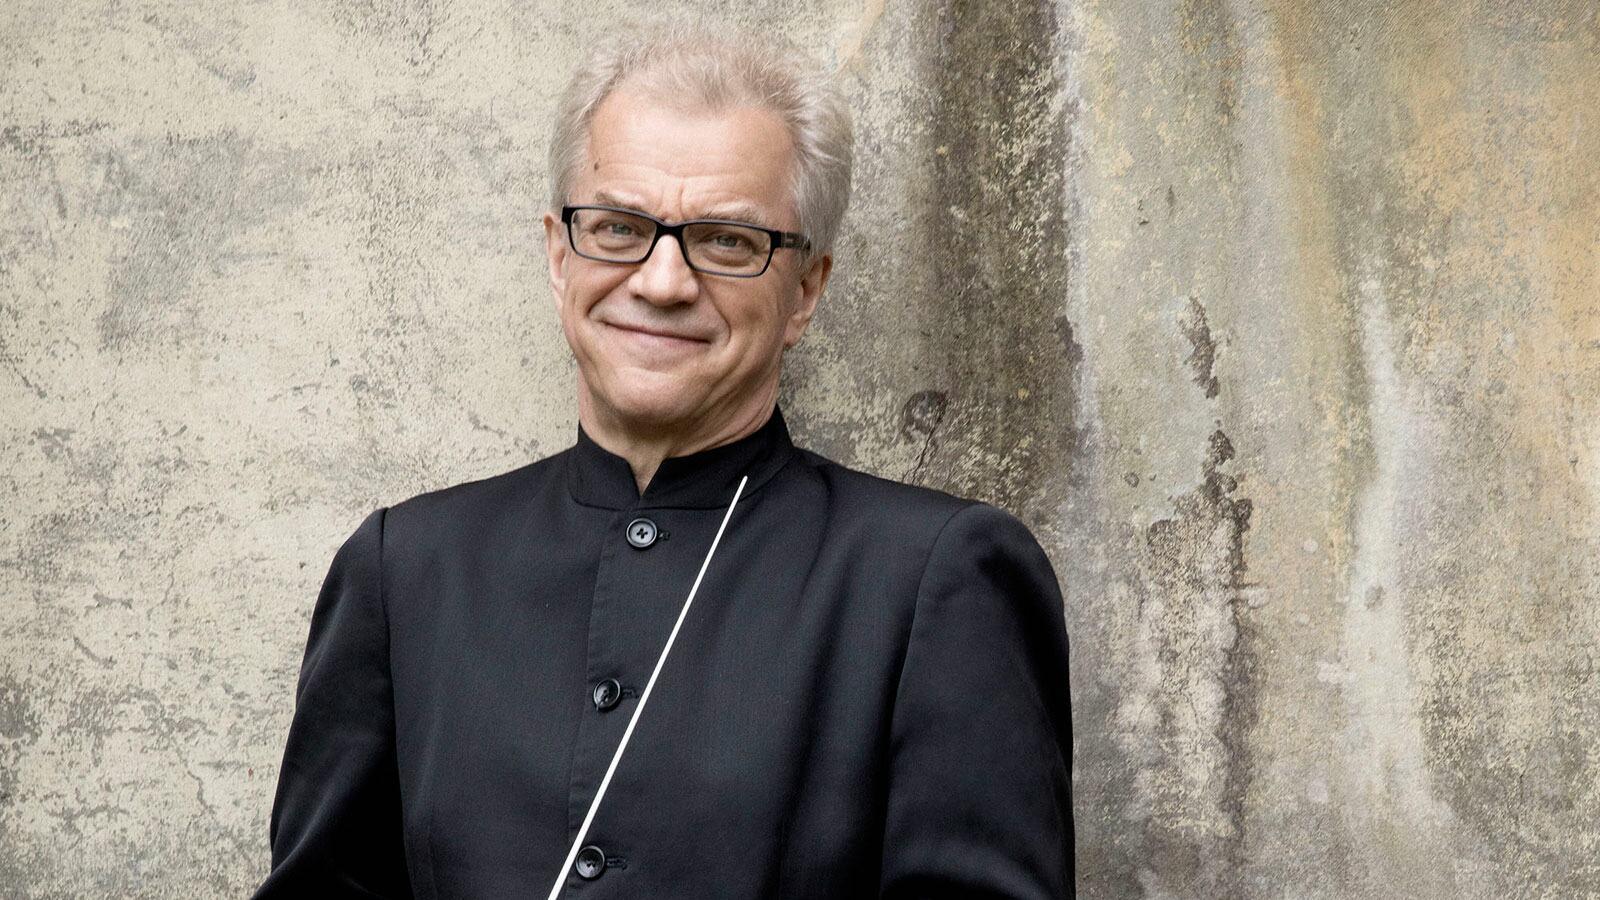 Osmo Vanska, conductor